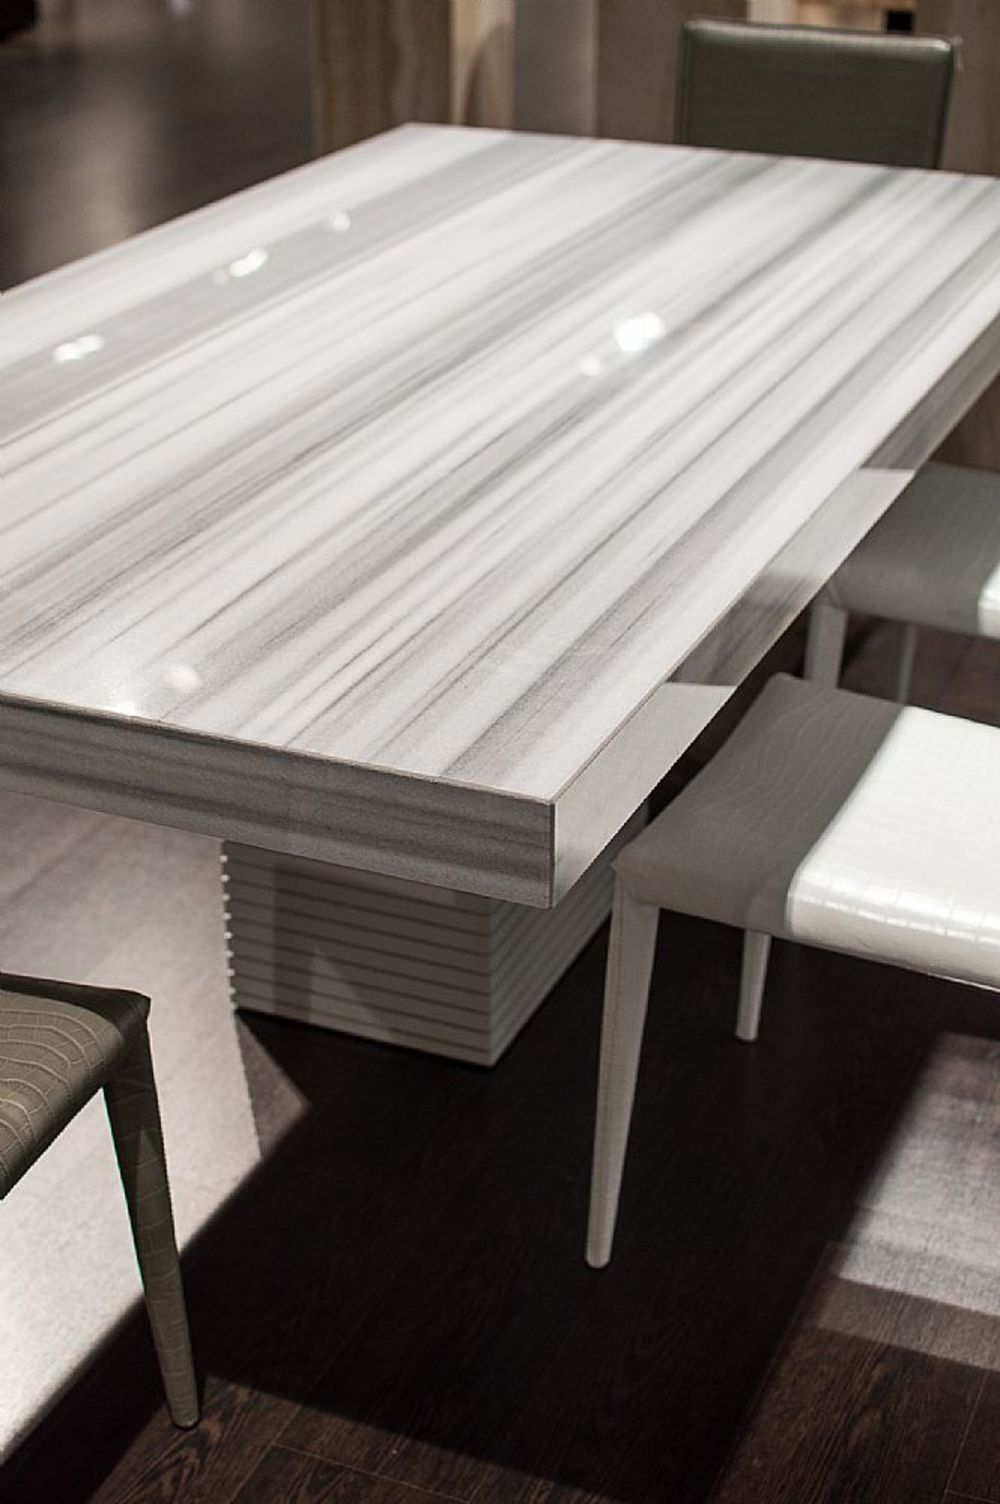 Stone International - Dining Table